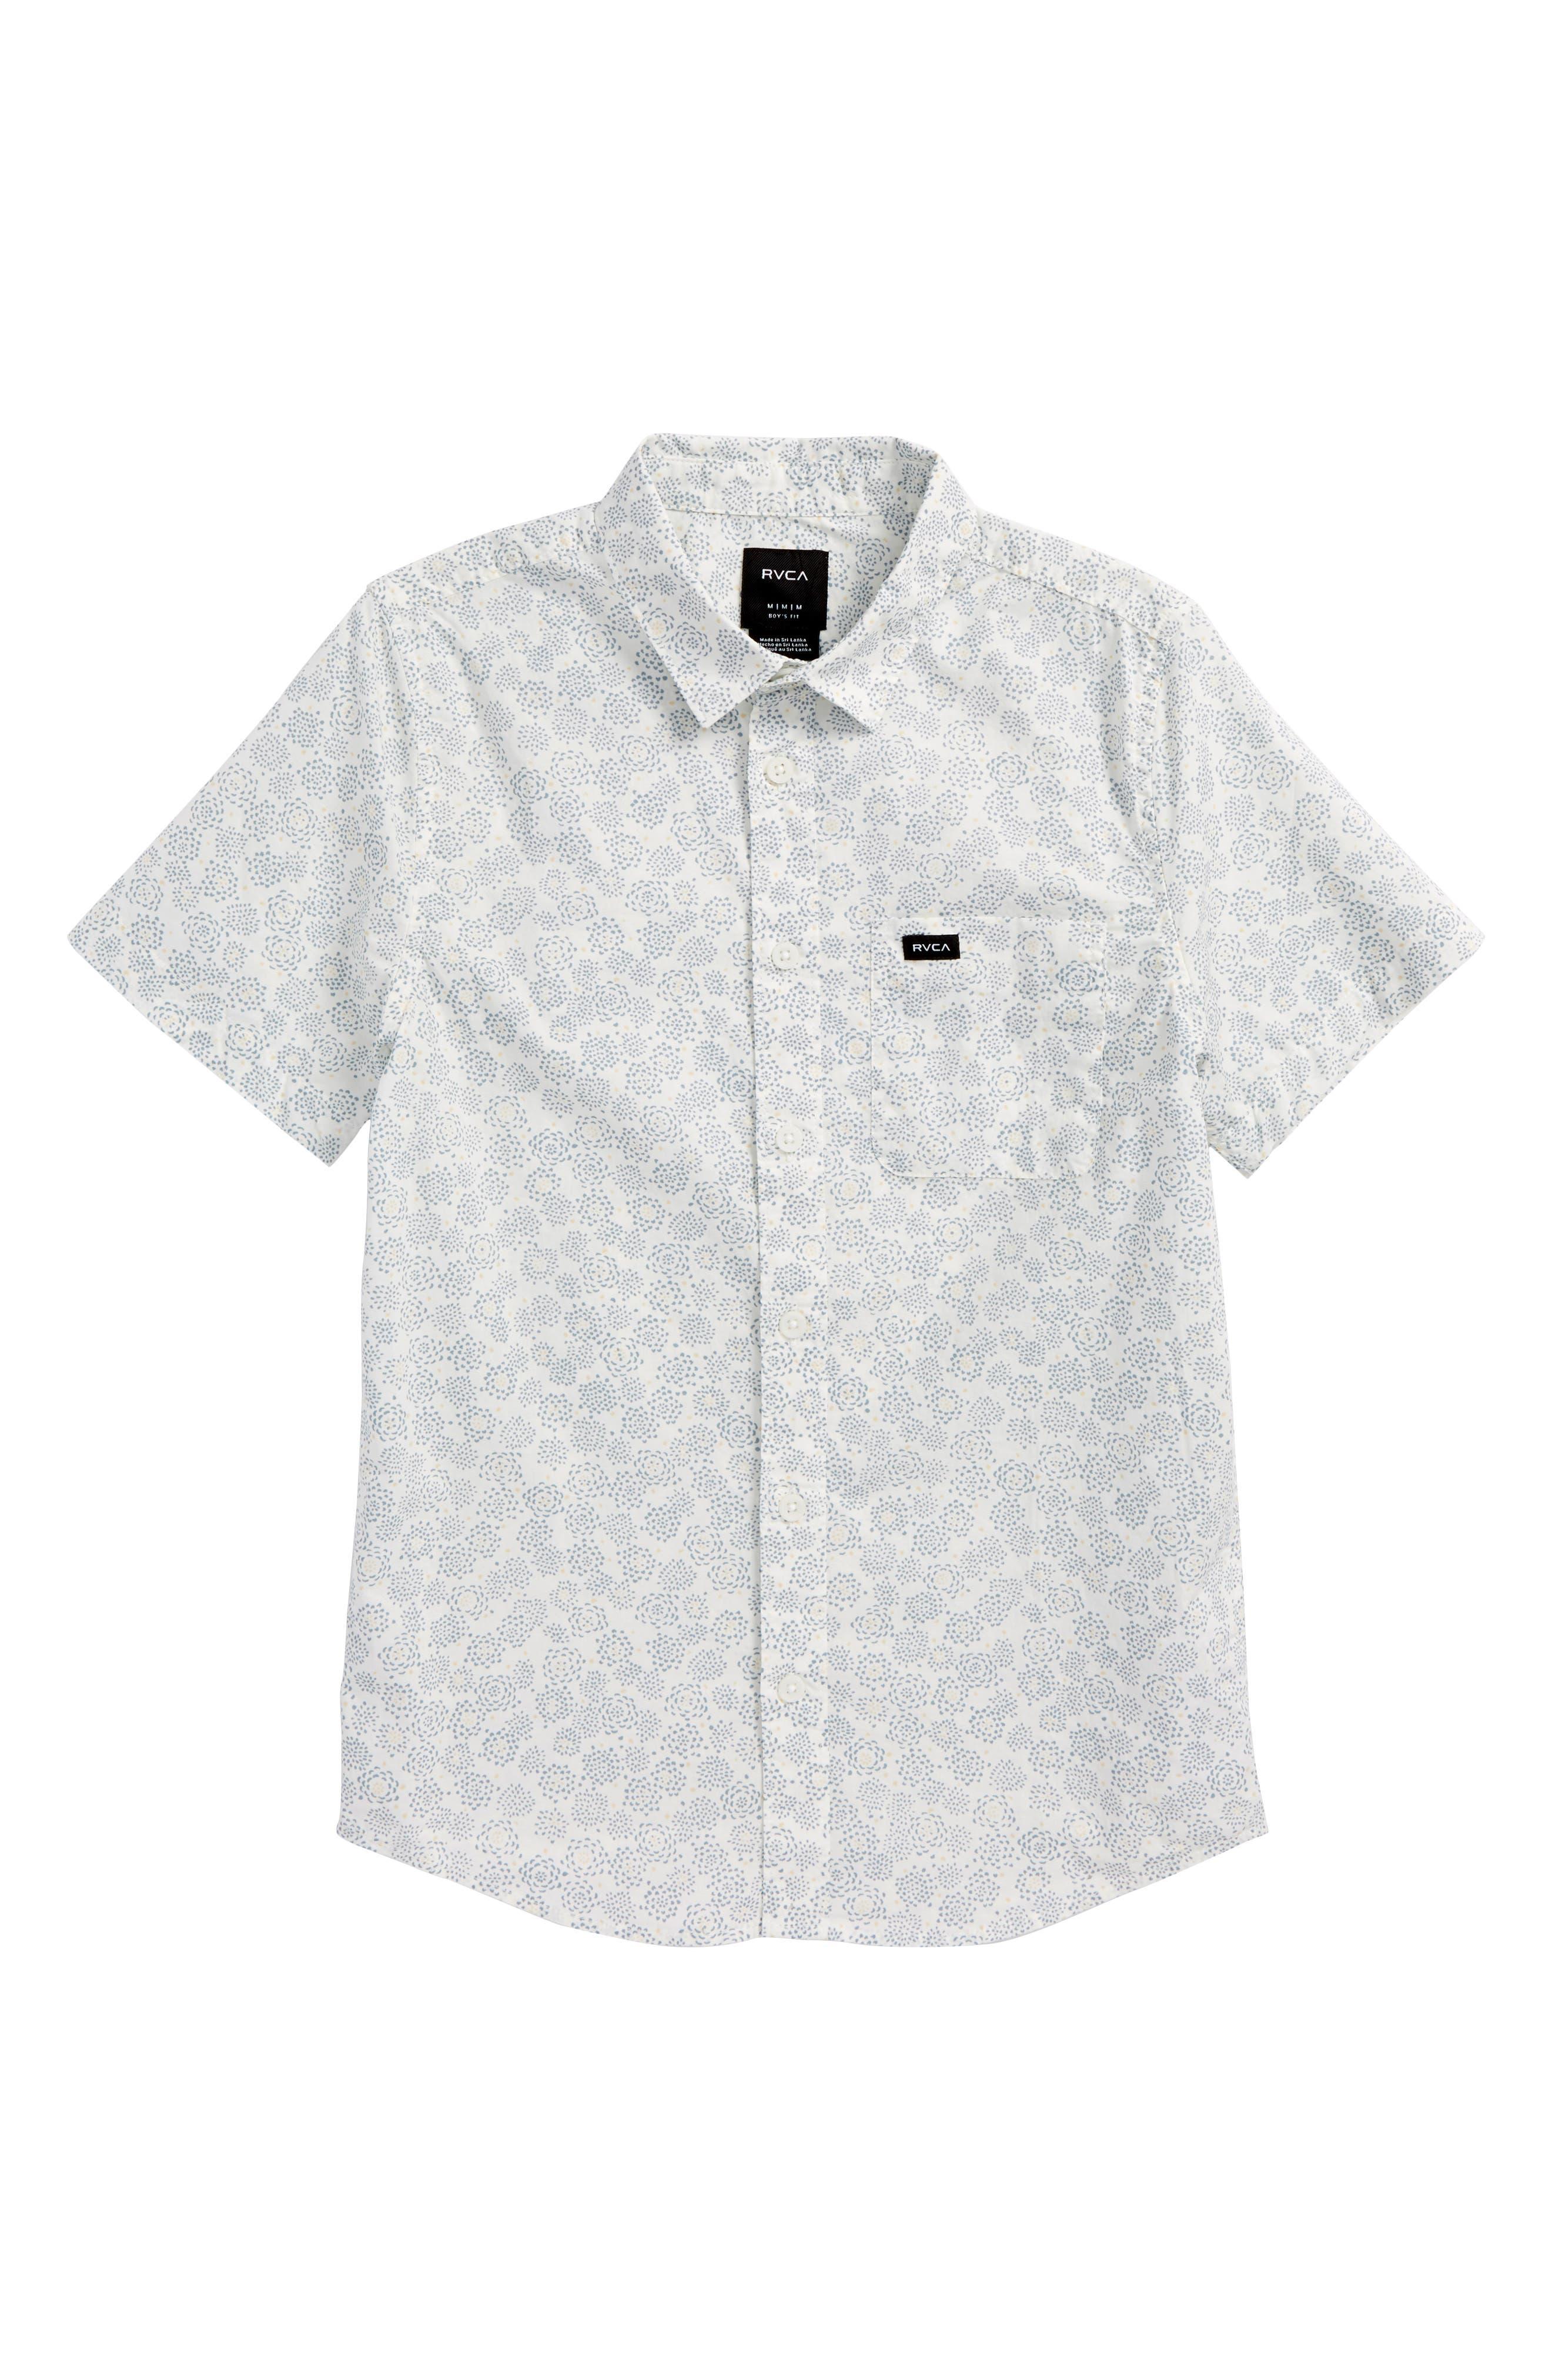 RVCA Cleta Woven Shirt (Big Boys)